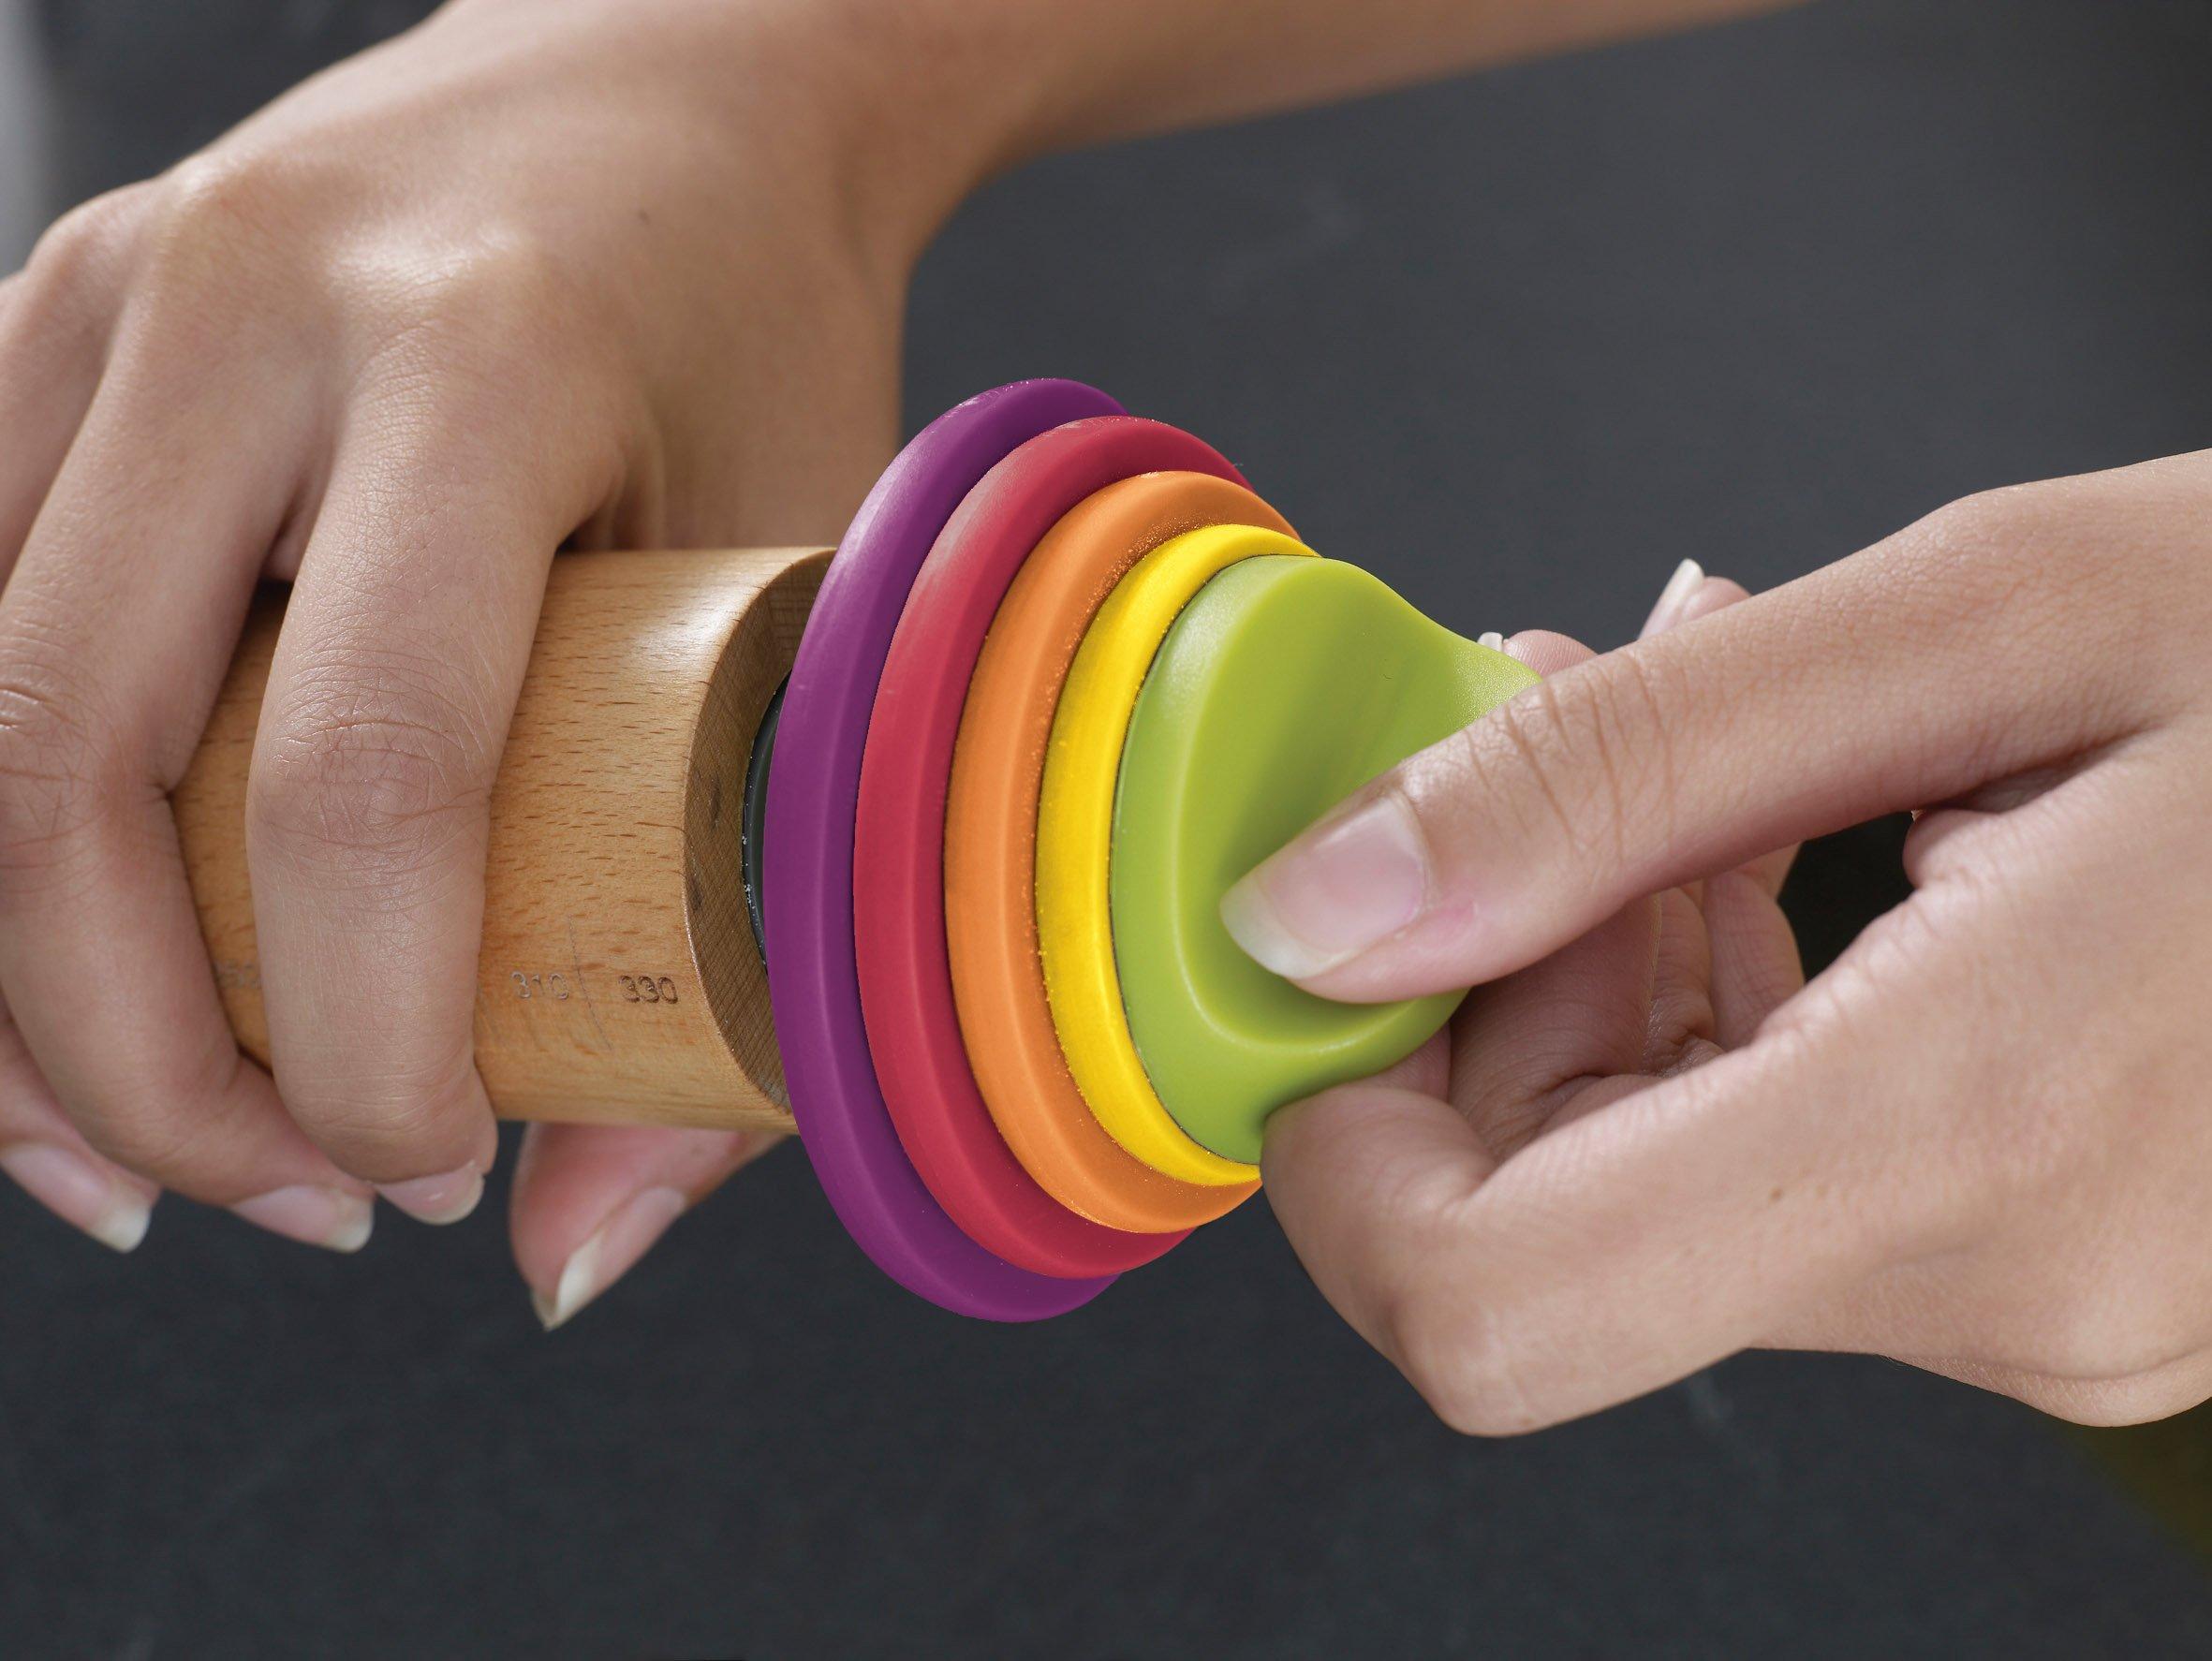 Joseph Joseph 20085 Adjustable Rolling Pin with Removable Rings, Multicolored by Joseph Joseph (Image #5)